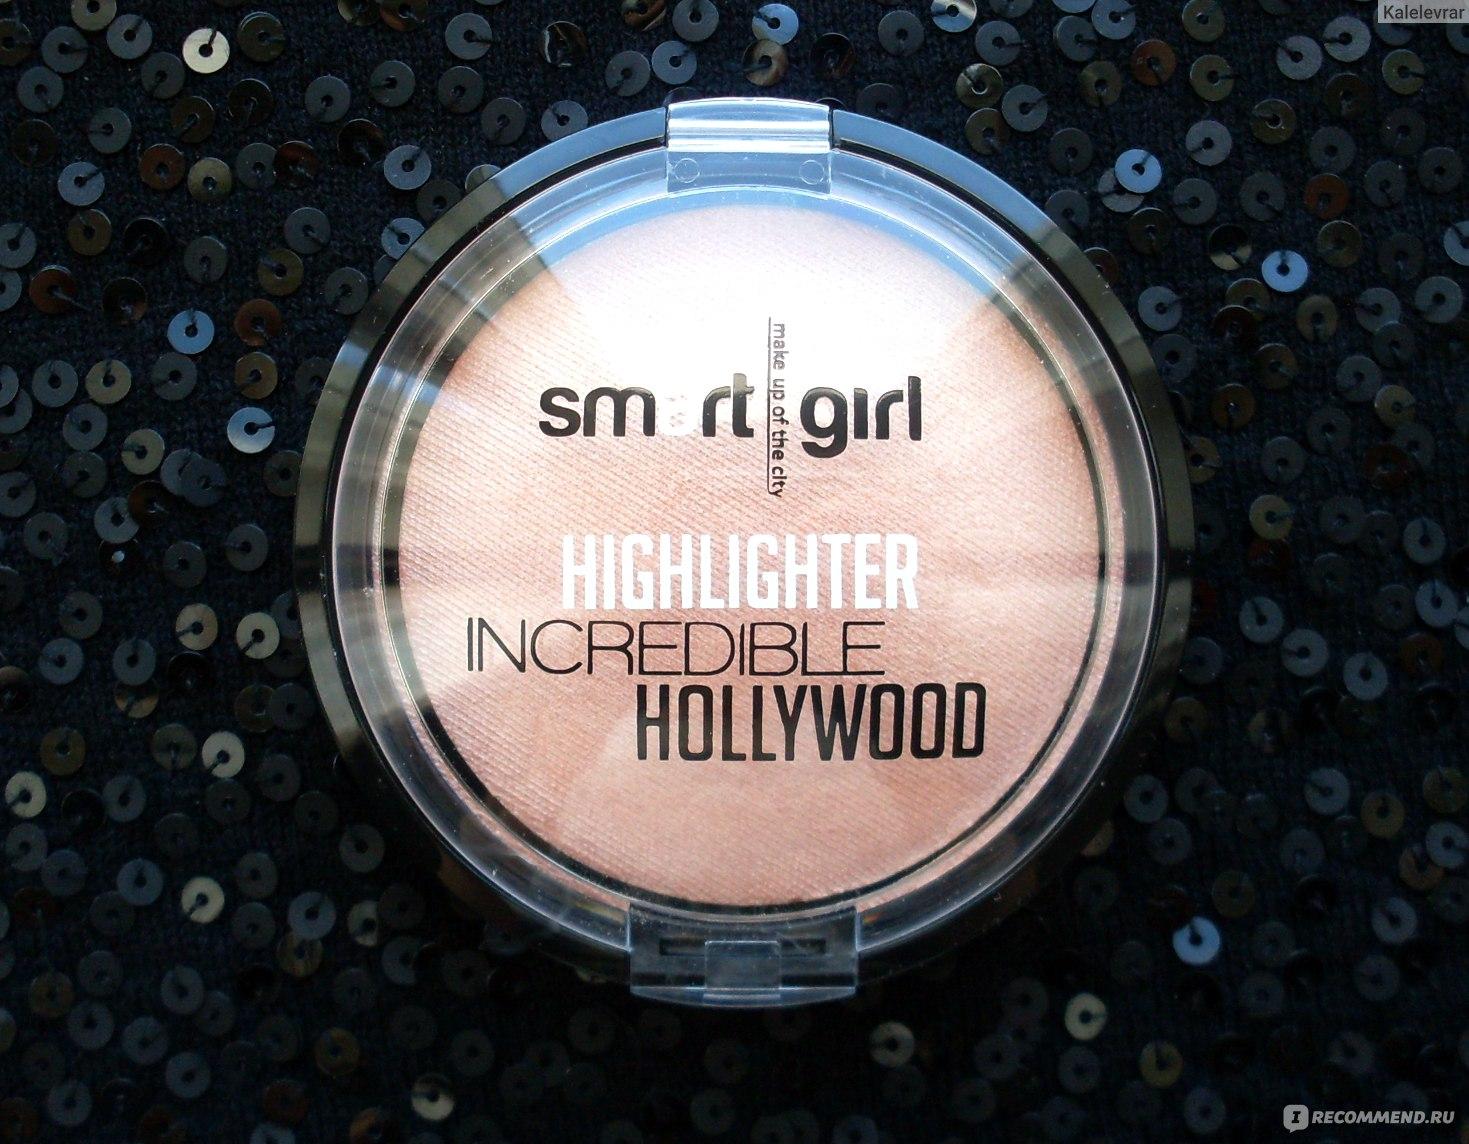 Хайлайтер BelorDesign Smart Girl Highlighter Incredible Hollywood Тон 02 NEW 13c6f72b86c9f